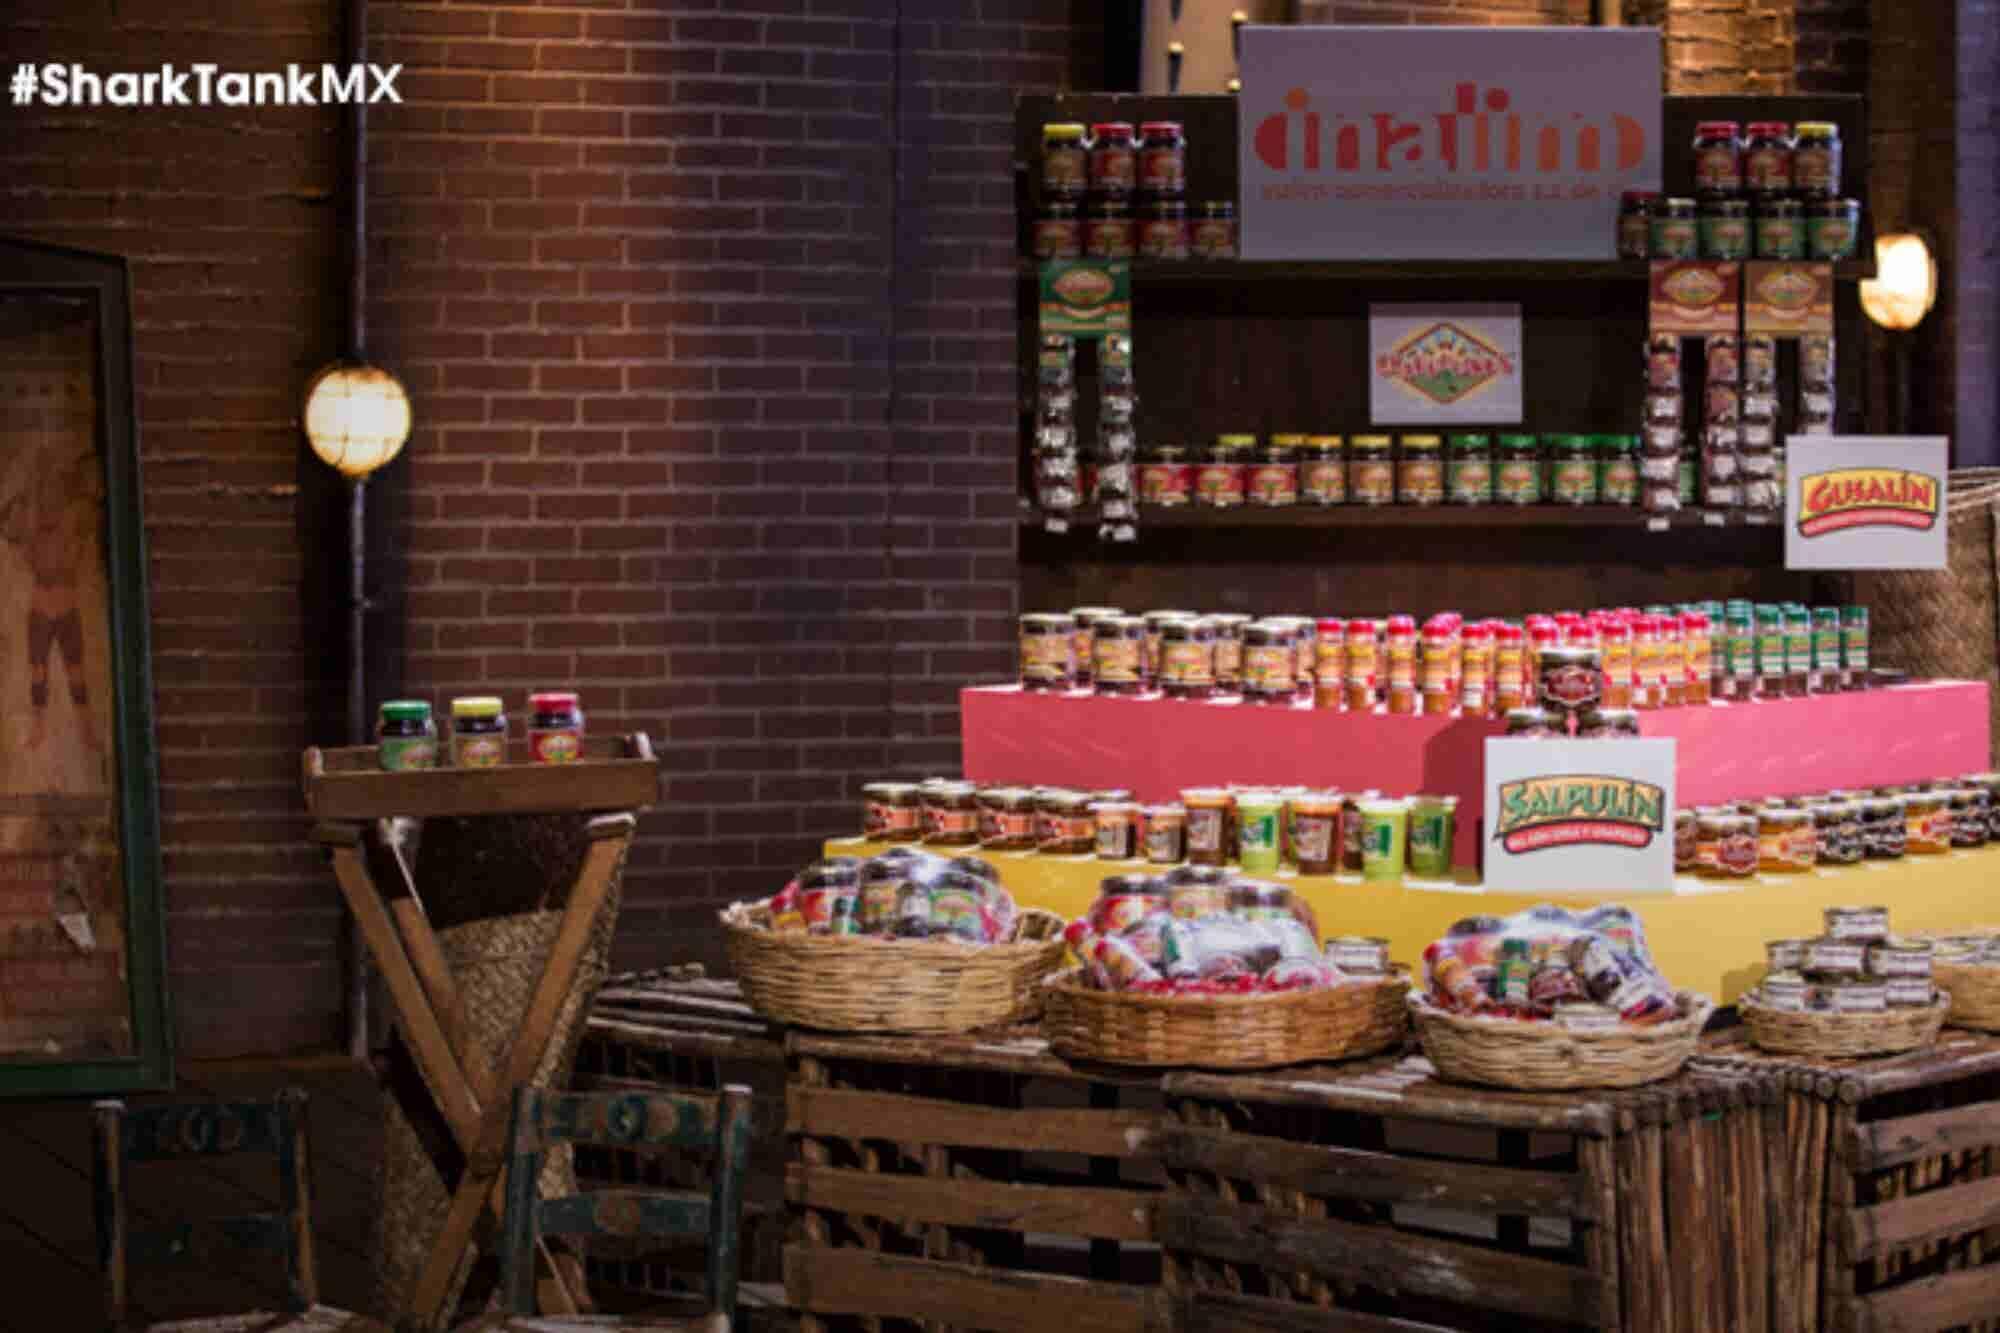 Las salsas de chapulín que consiguieron 10 millones en Shark Tank México